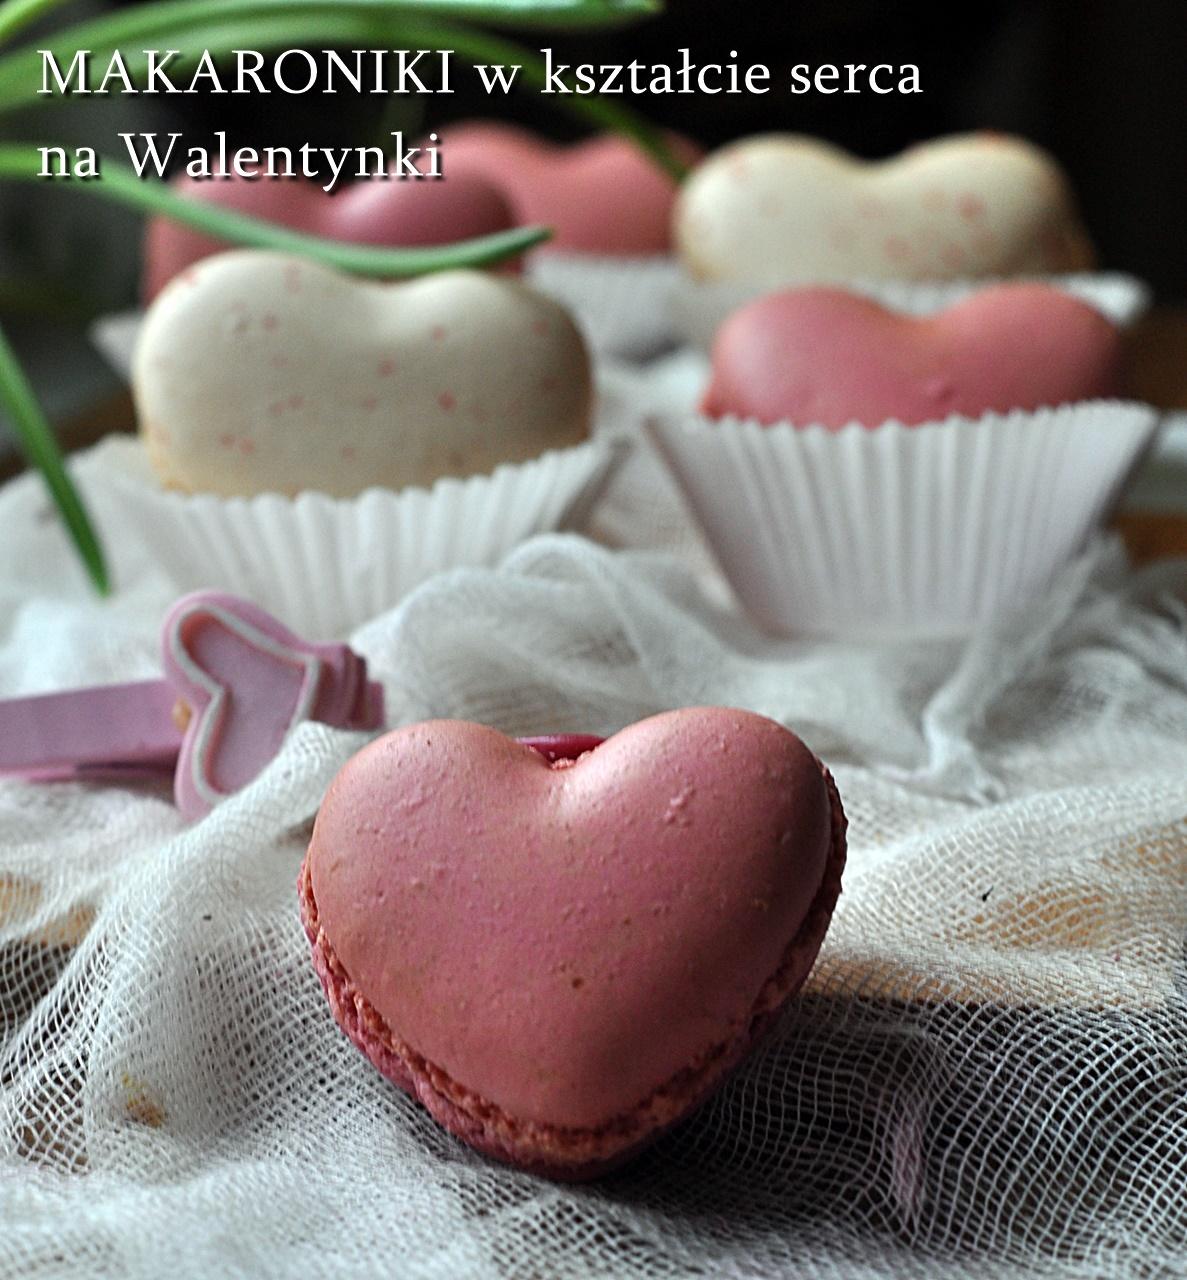 makaroniki na Walentynki